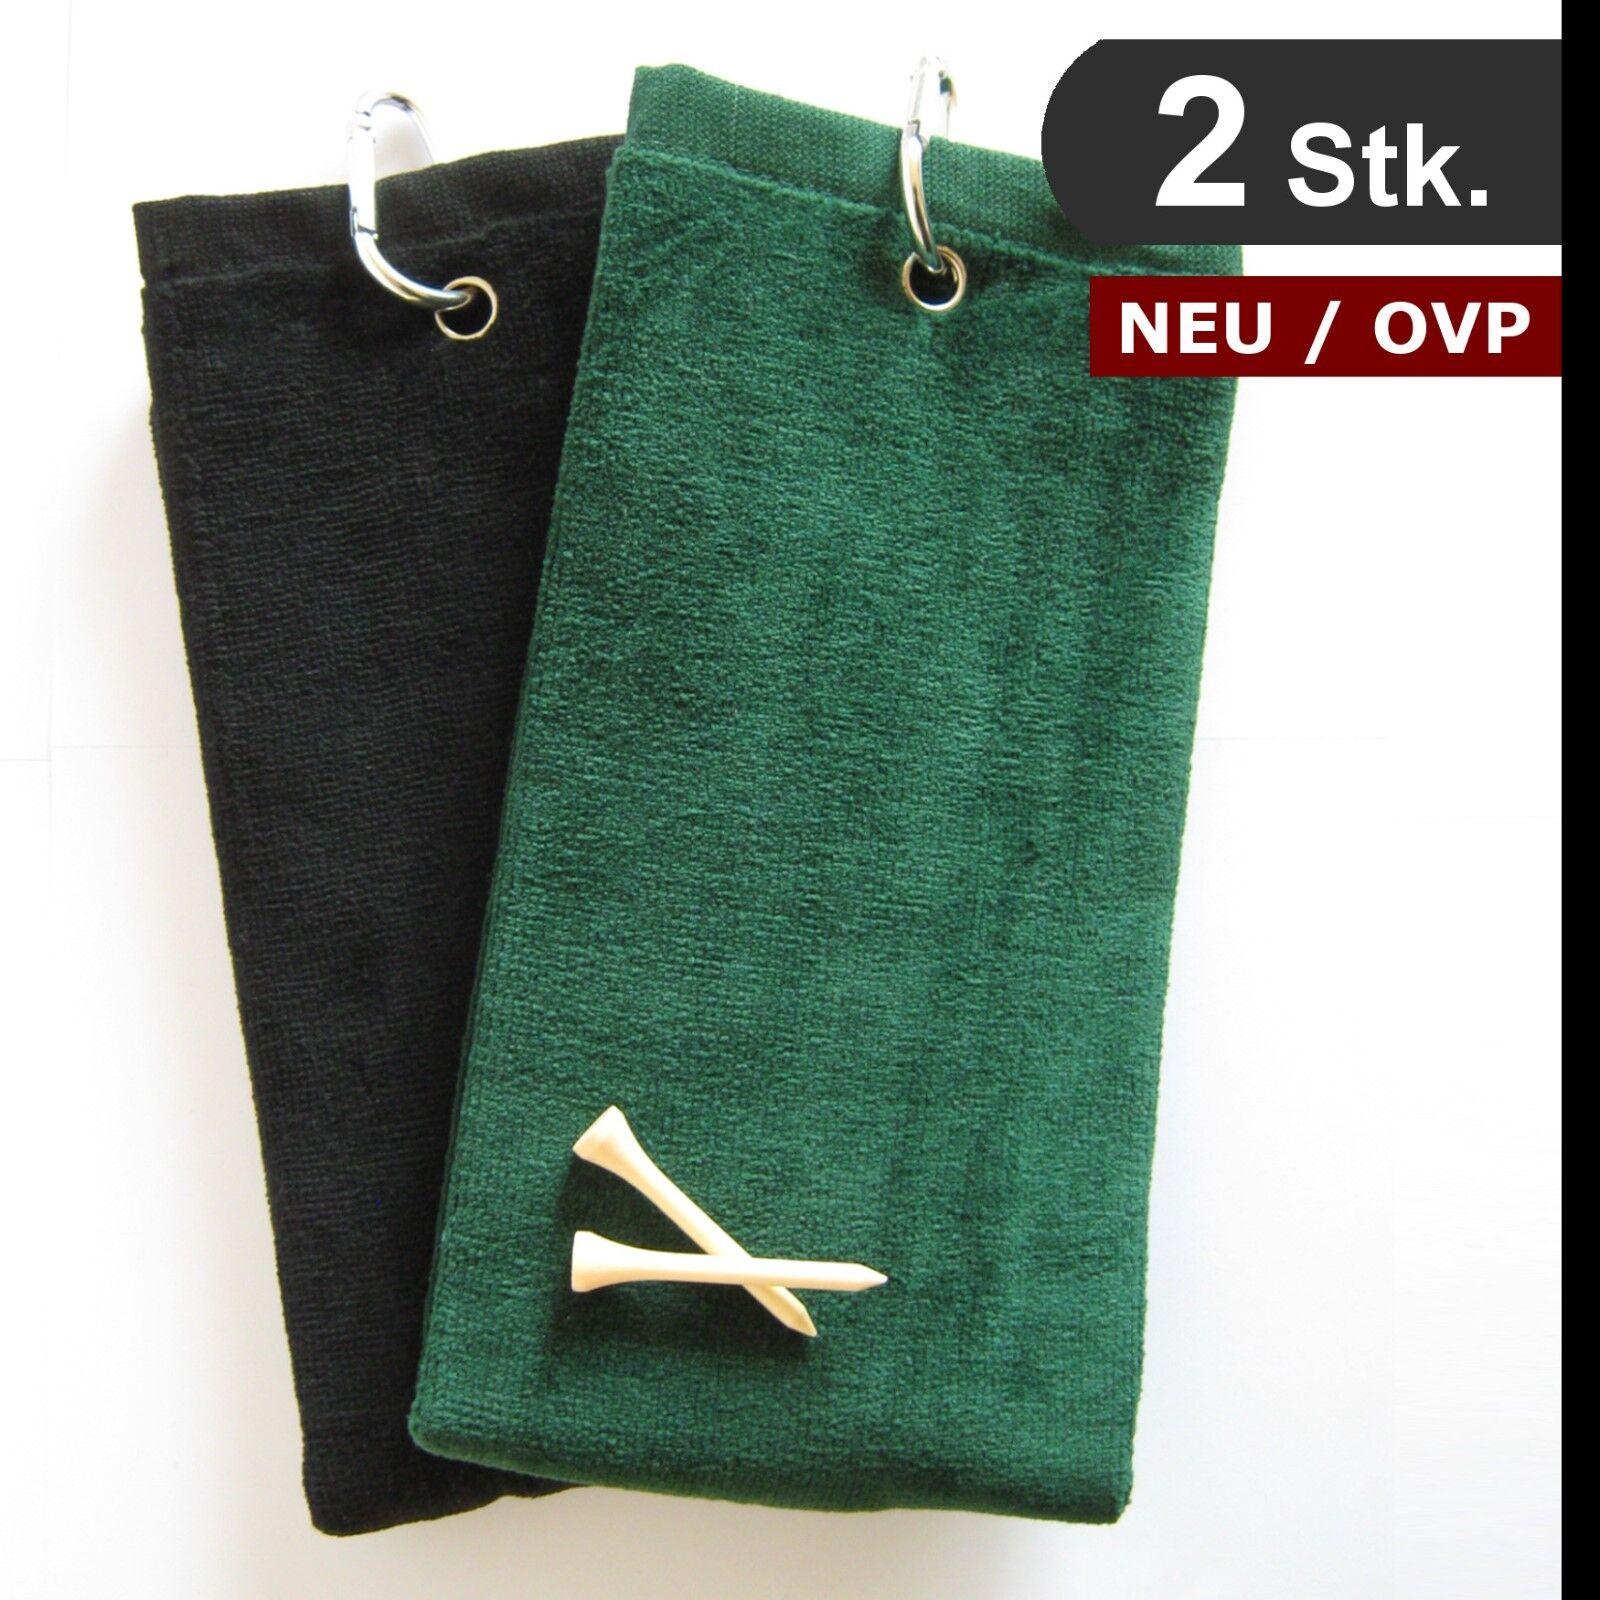 2 Stk Golf Towel / Handtuch / 50 x 35cm, tri-fold / 1A-Qualität / schwarz + grün